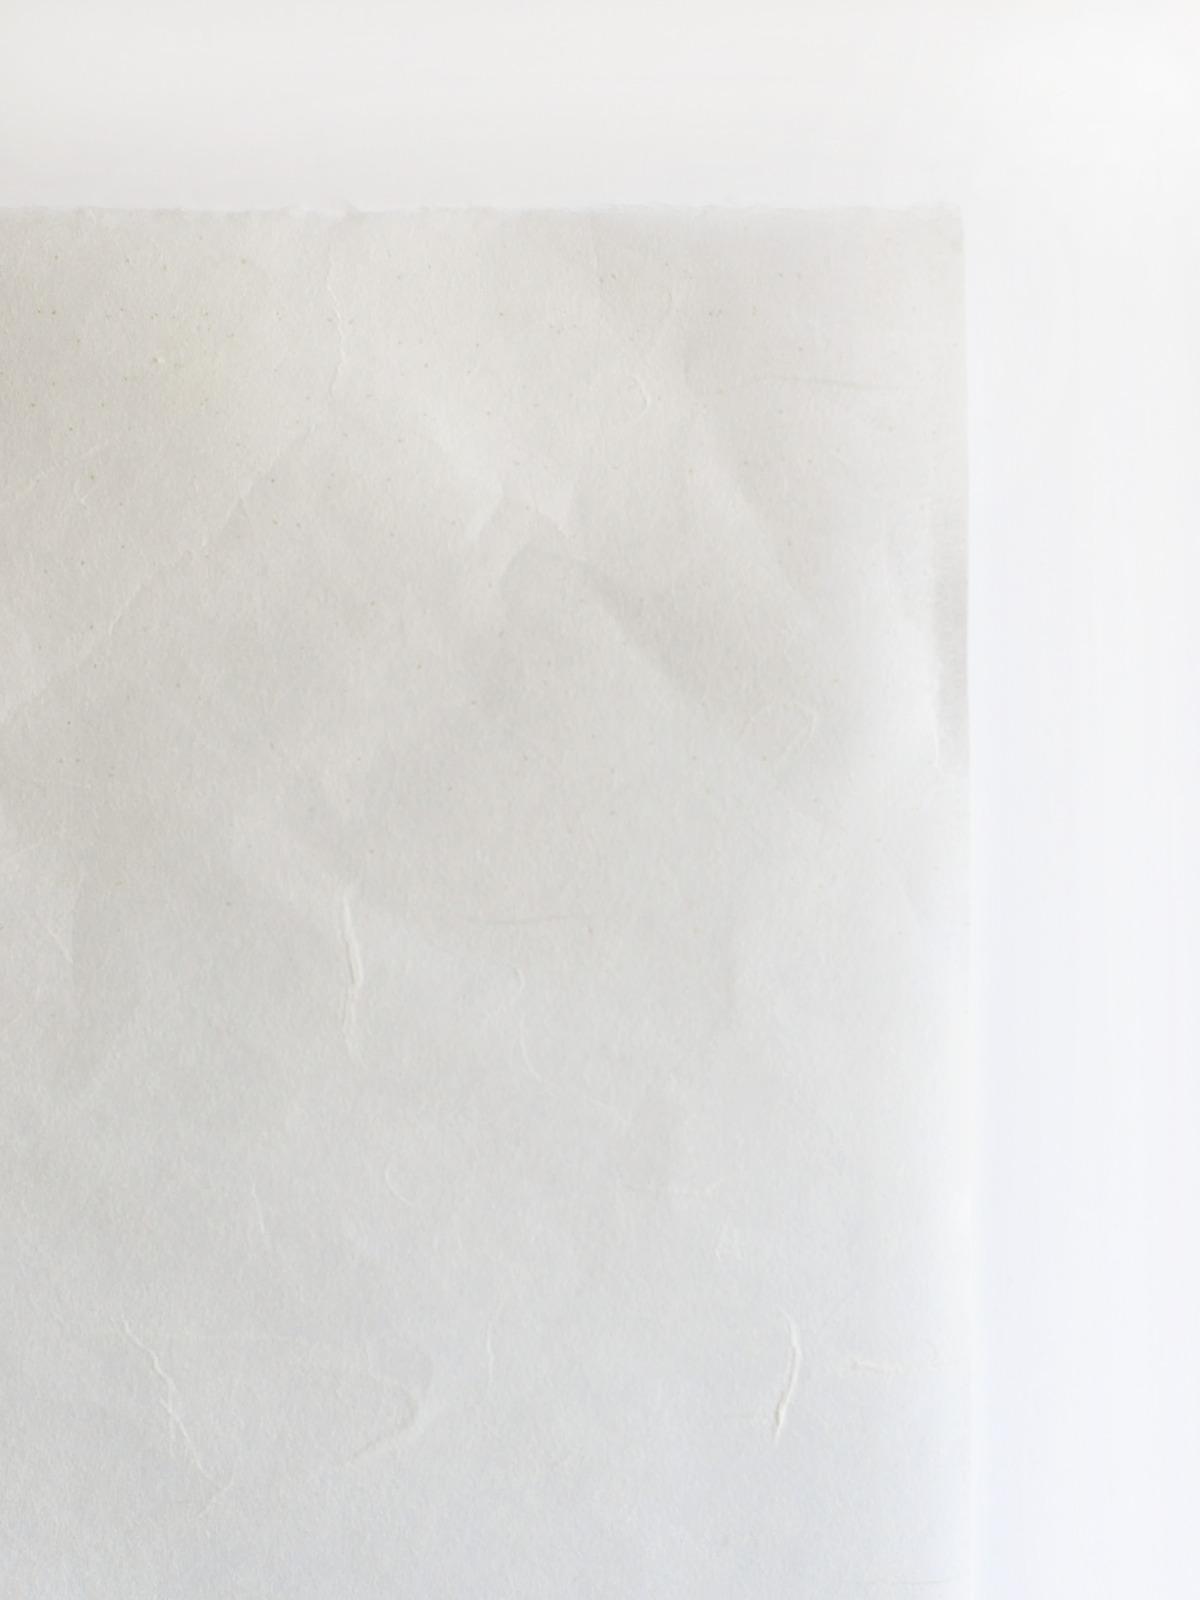 Legion Paper Unryu Paper Sheets